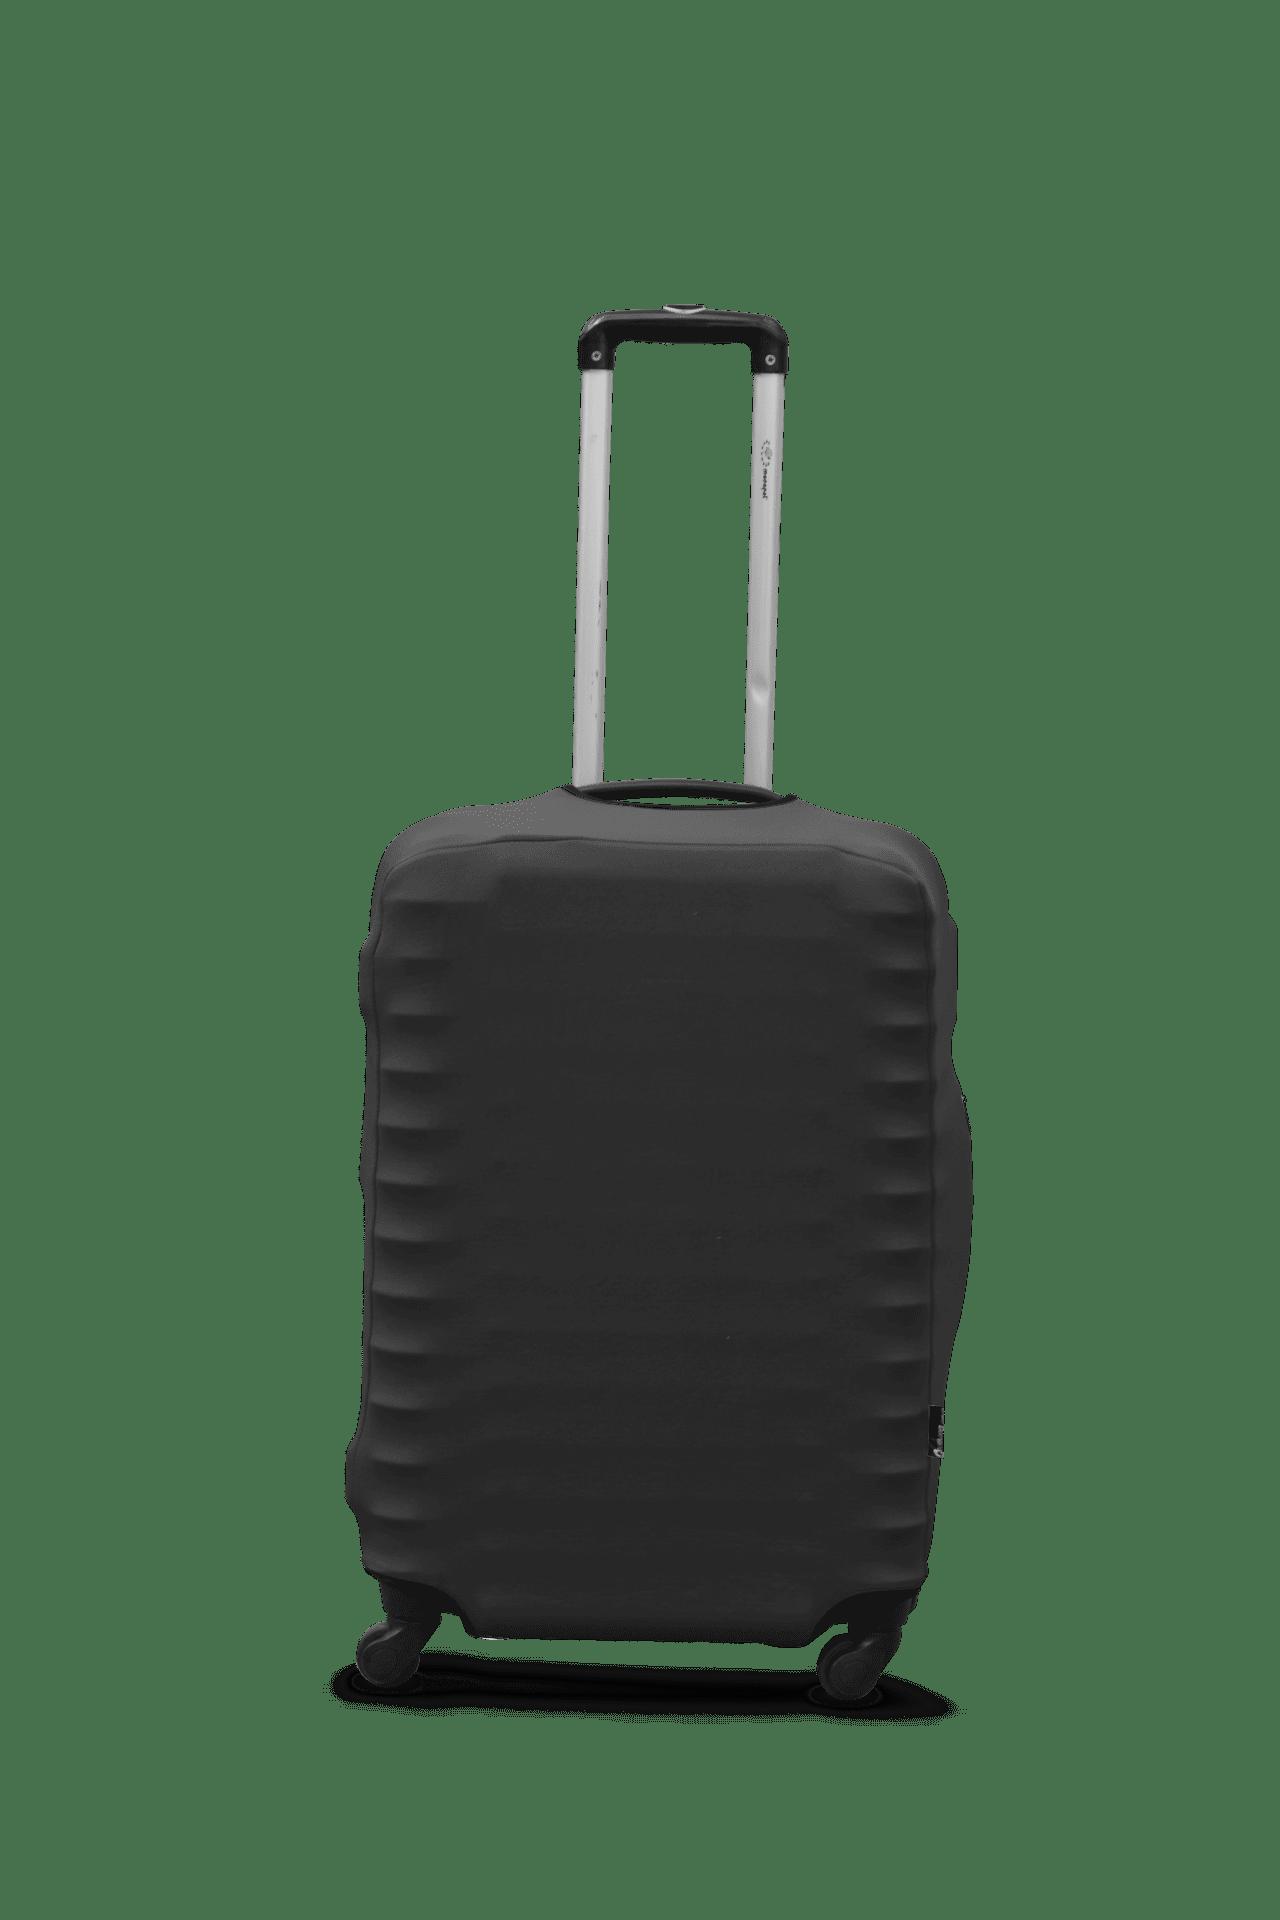 Husa pentru valiza daiving Cover dawing L GREY